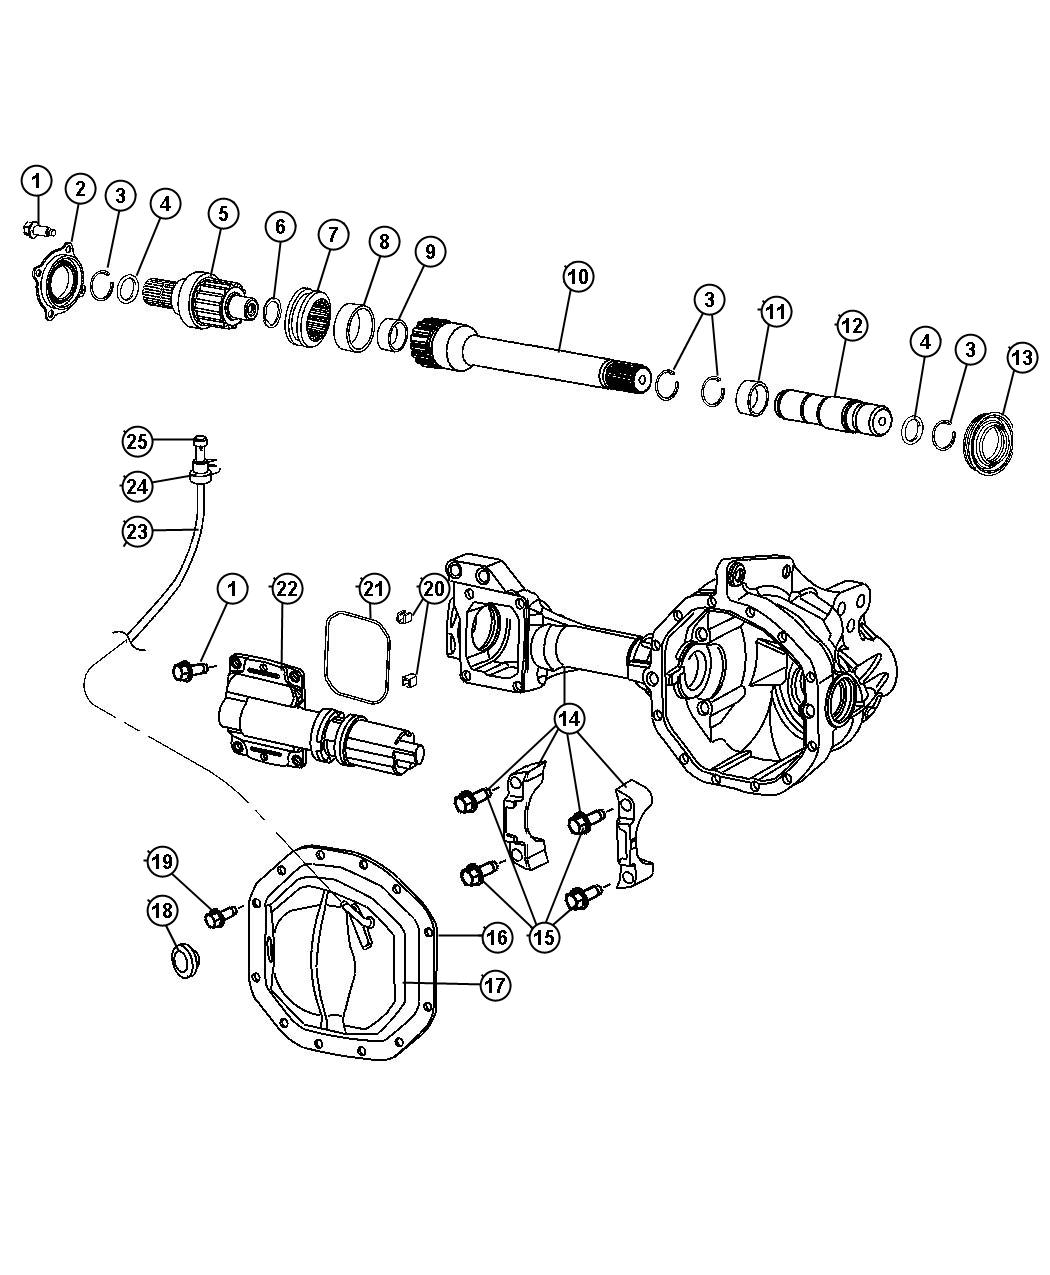 dodge ram 2500 4x4 front axle diagram